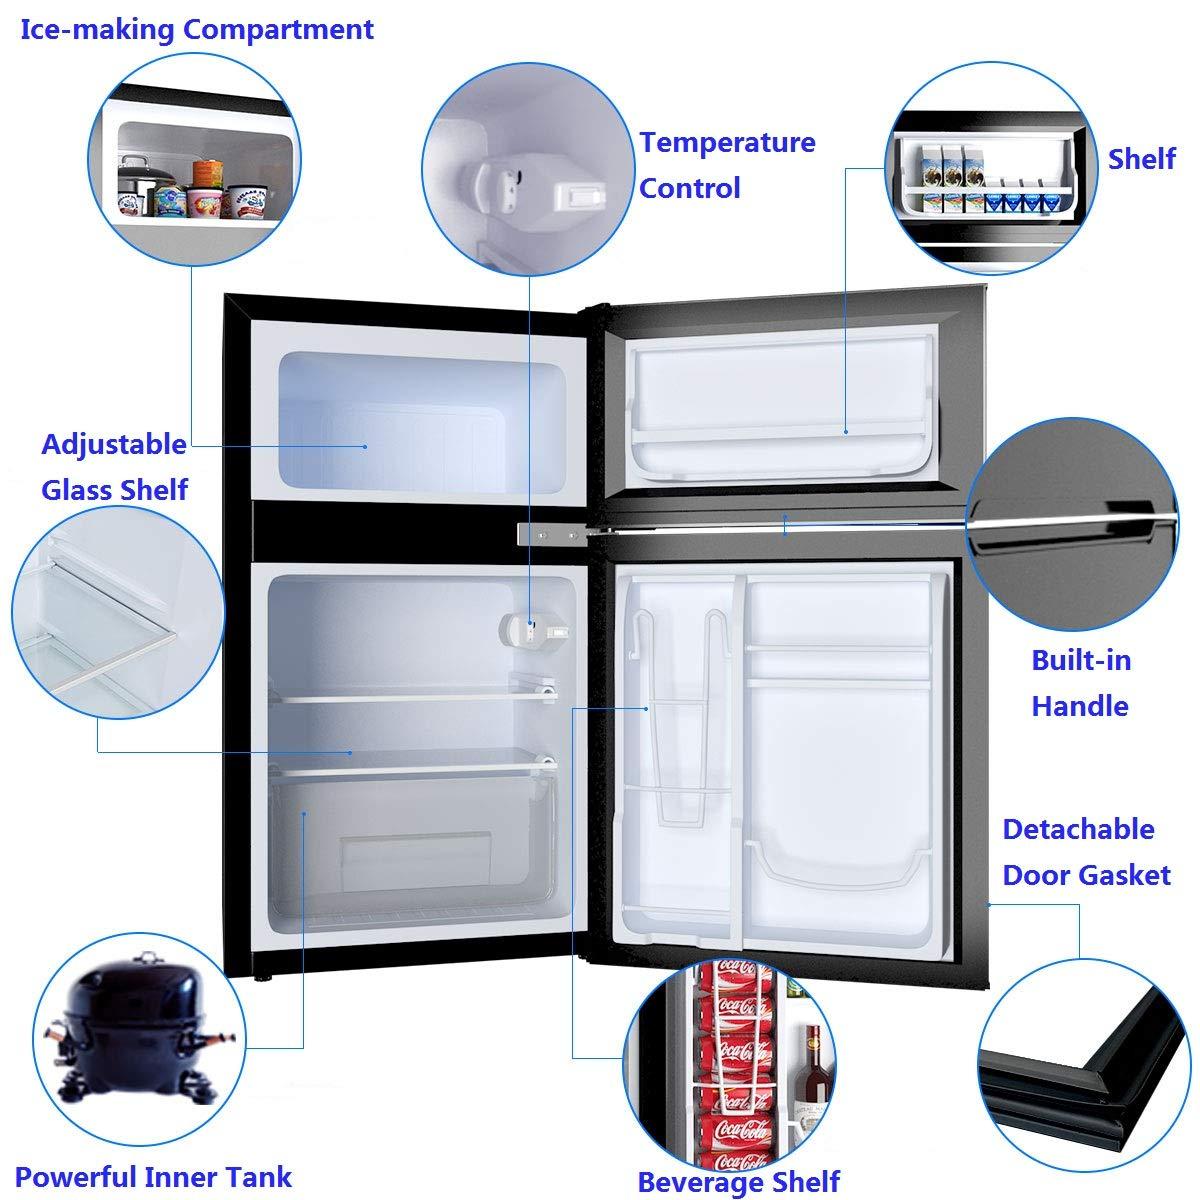 Unit Small Freezer Cooler Fridge COSTWAY Compact Refrigerator 3.2 cu ft Black